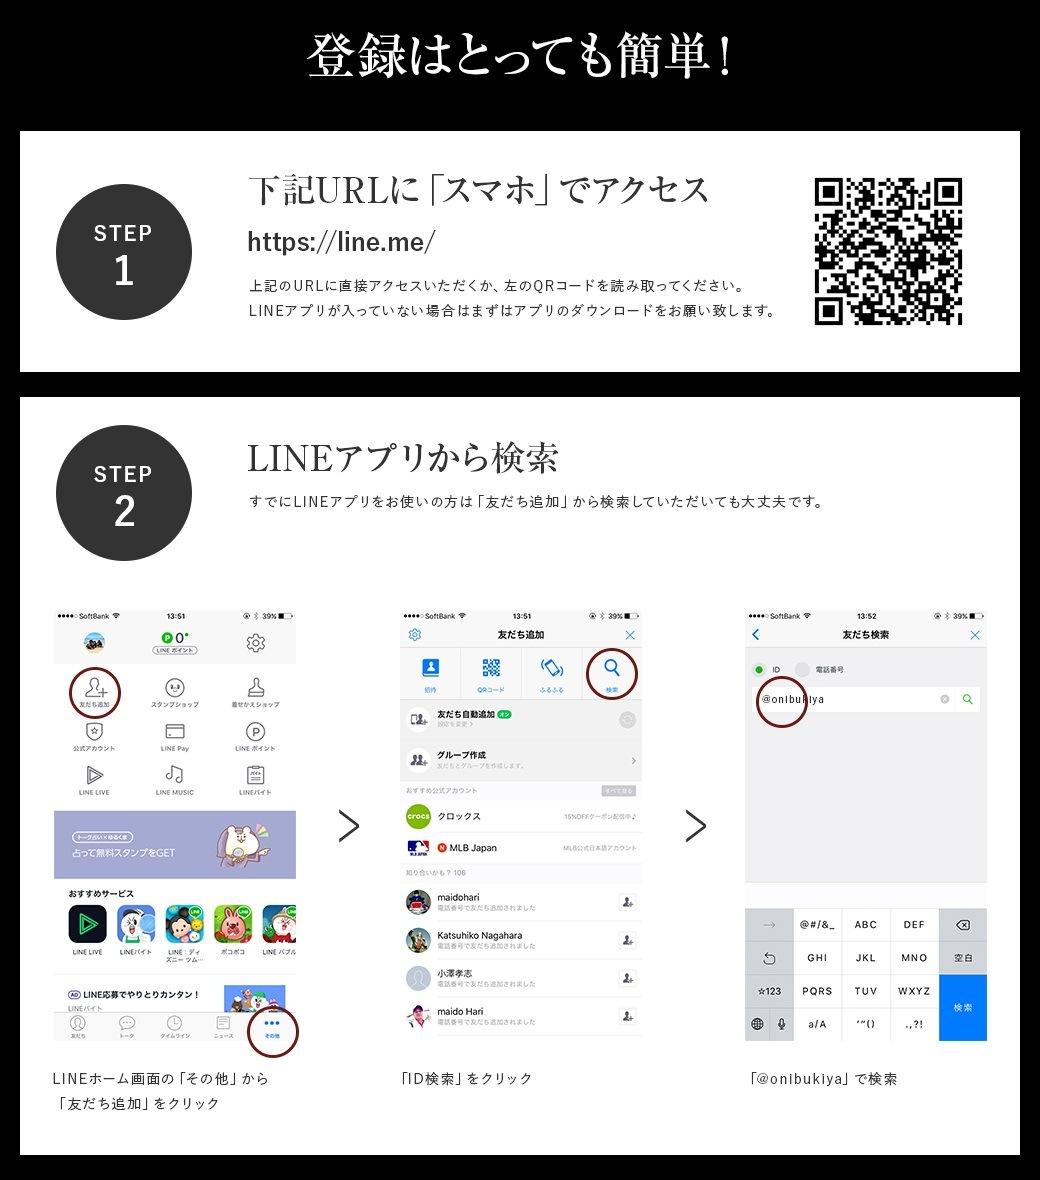 Line@お友達追加キャンペーン